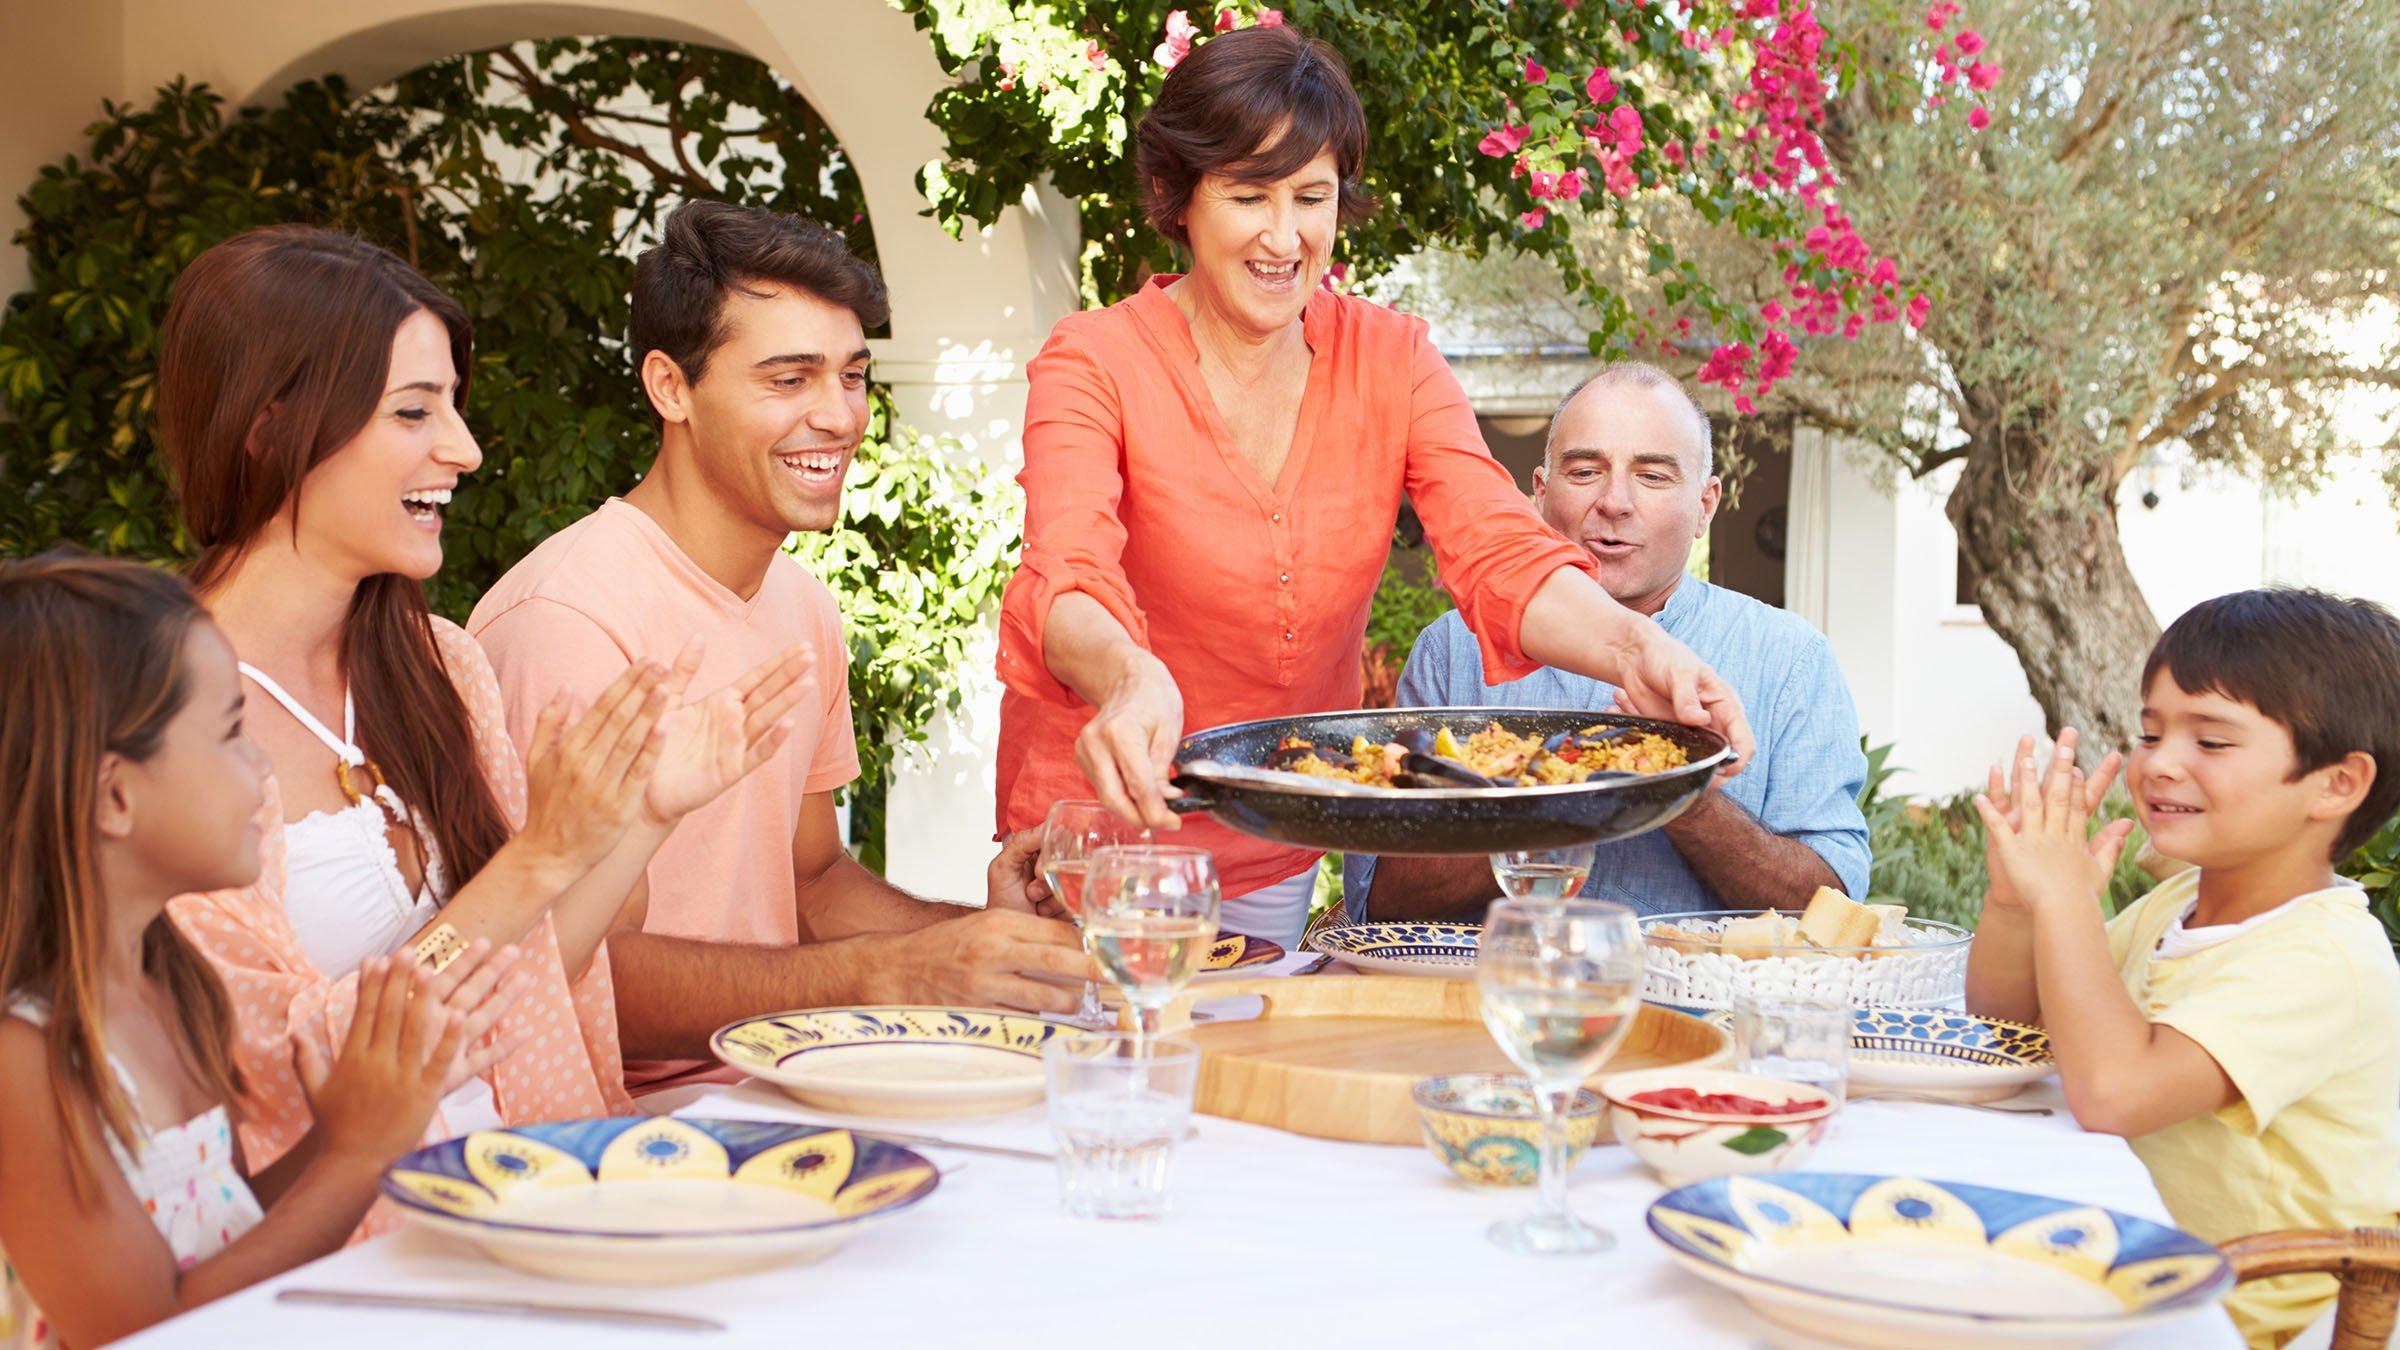 costumbres españolas la comida